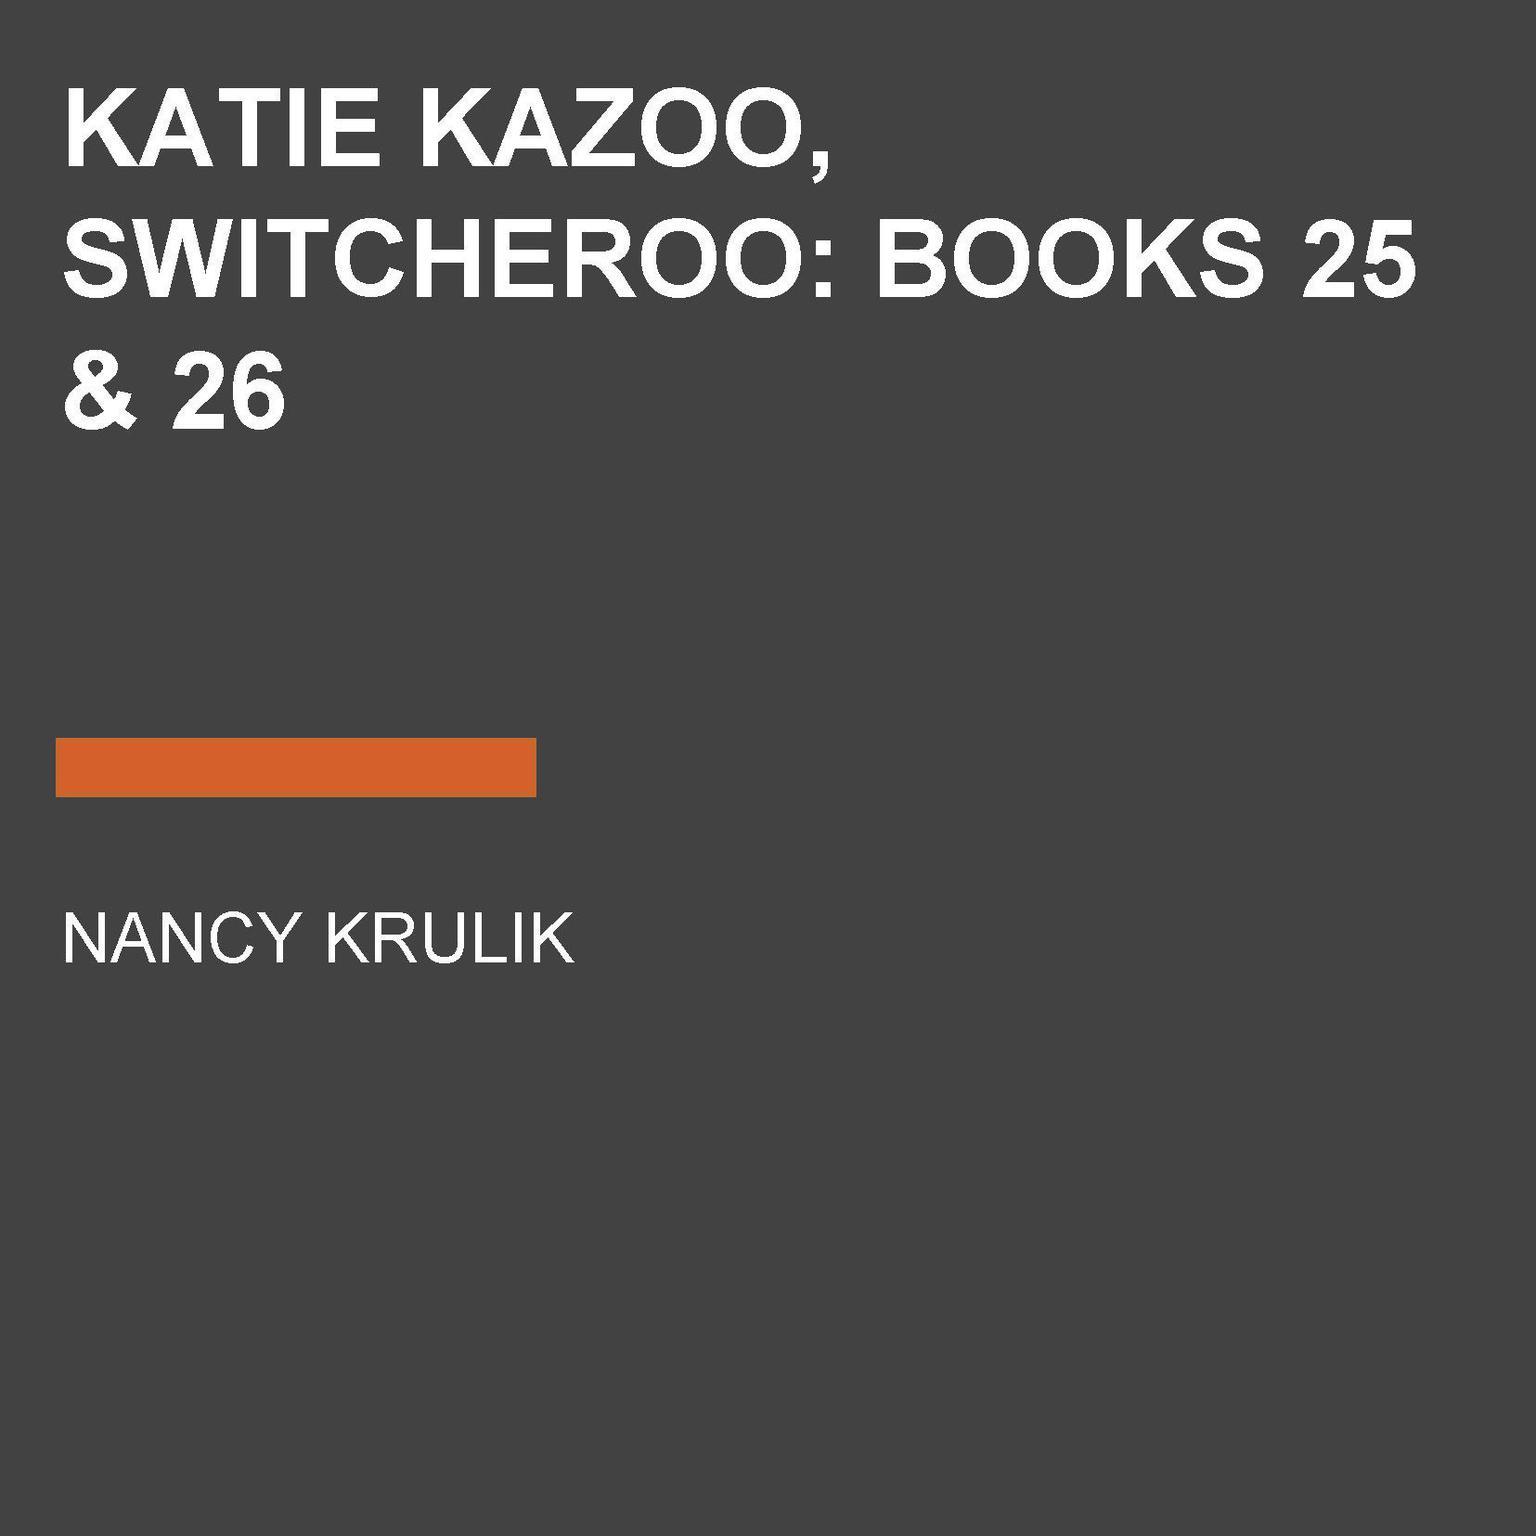 Katie Kazoo, Switcheroo: Books 25 & 26 Audiobook, by Nancy Krulik